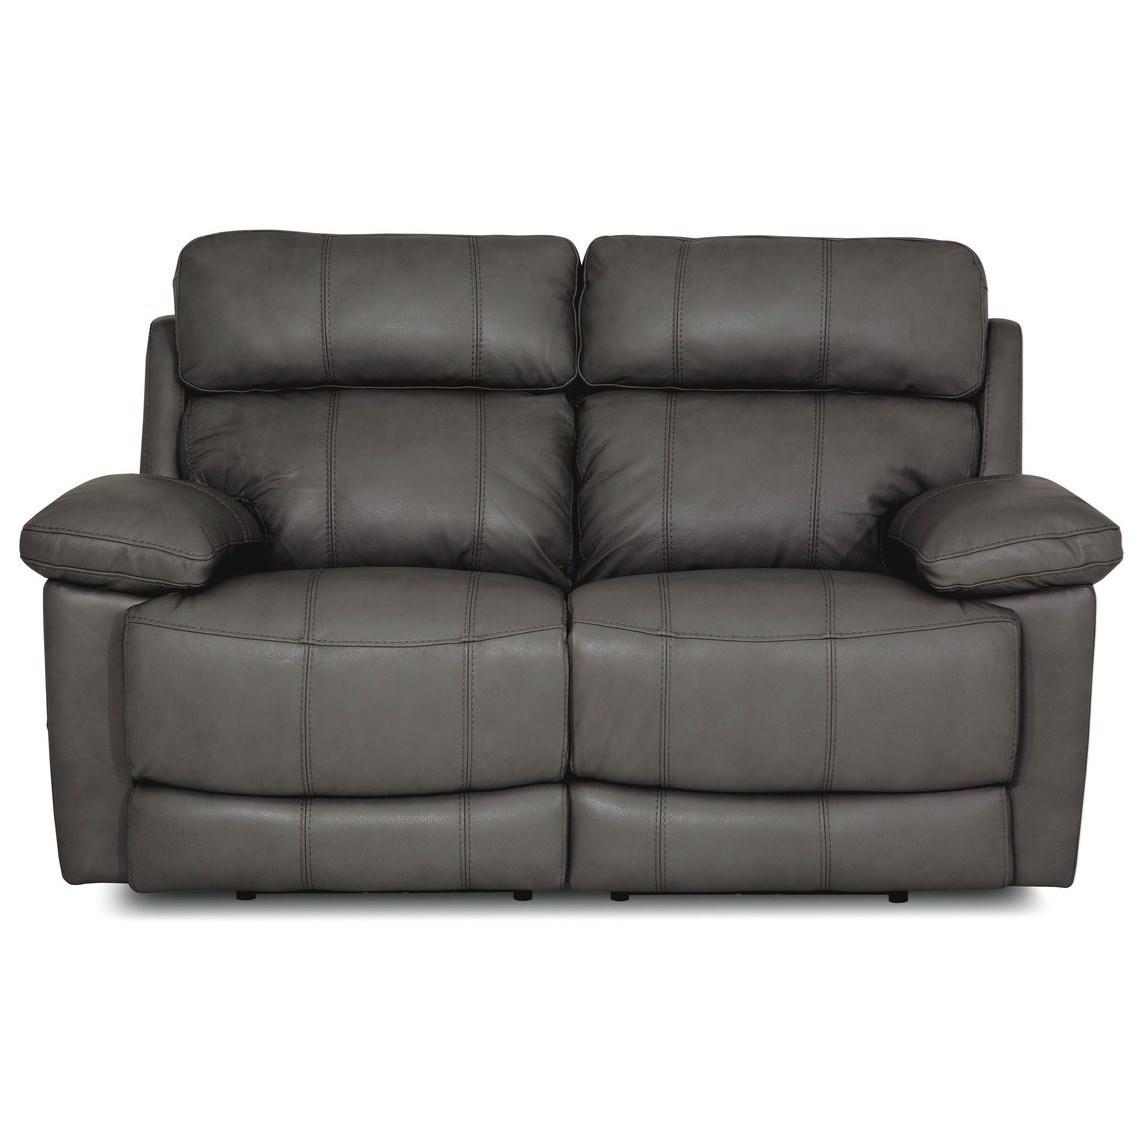 Palliser Finley Casual Power Headrest Reclining Loveseat With Usb Ports Darvin Furniture Loveseats